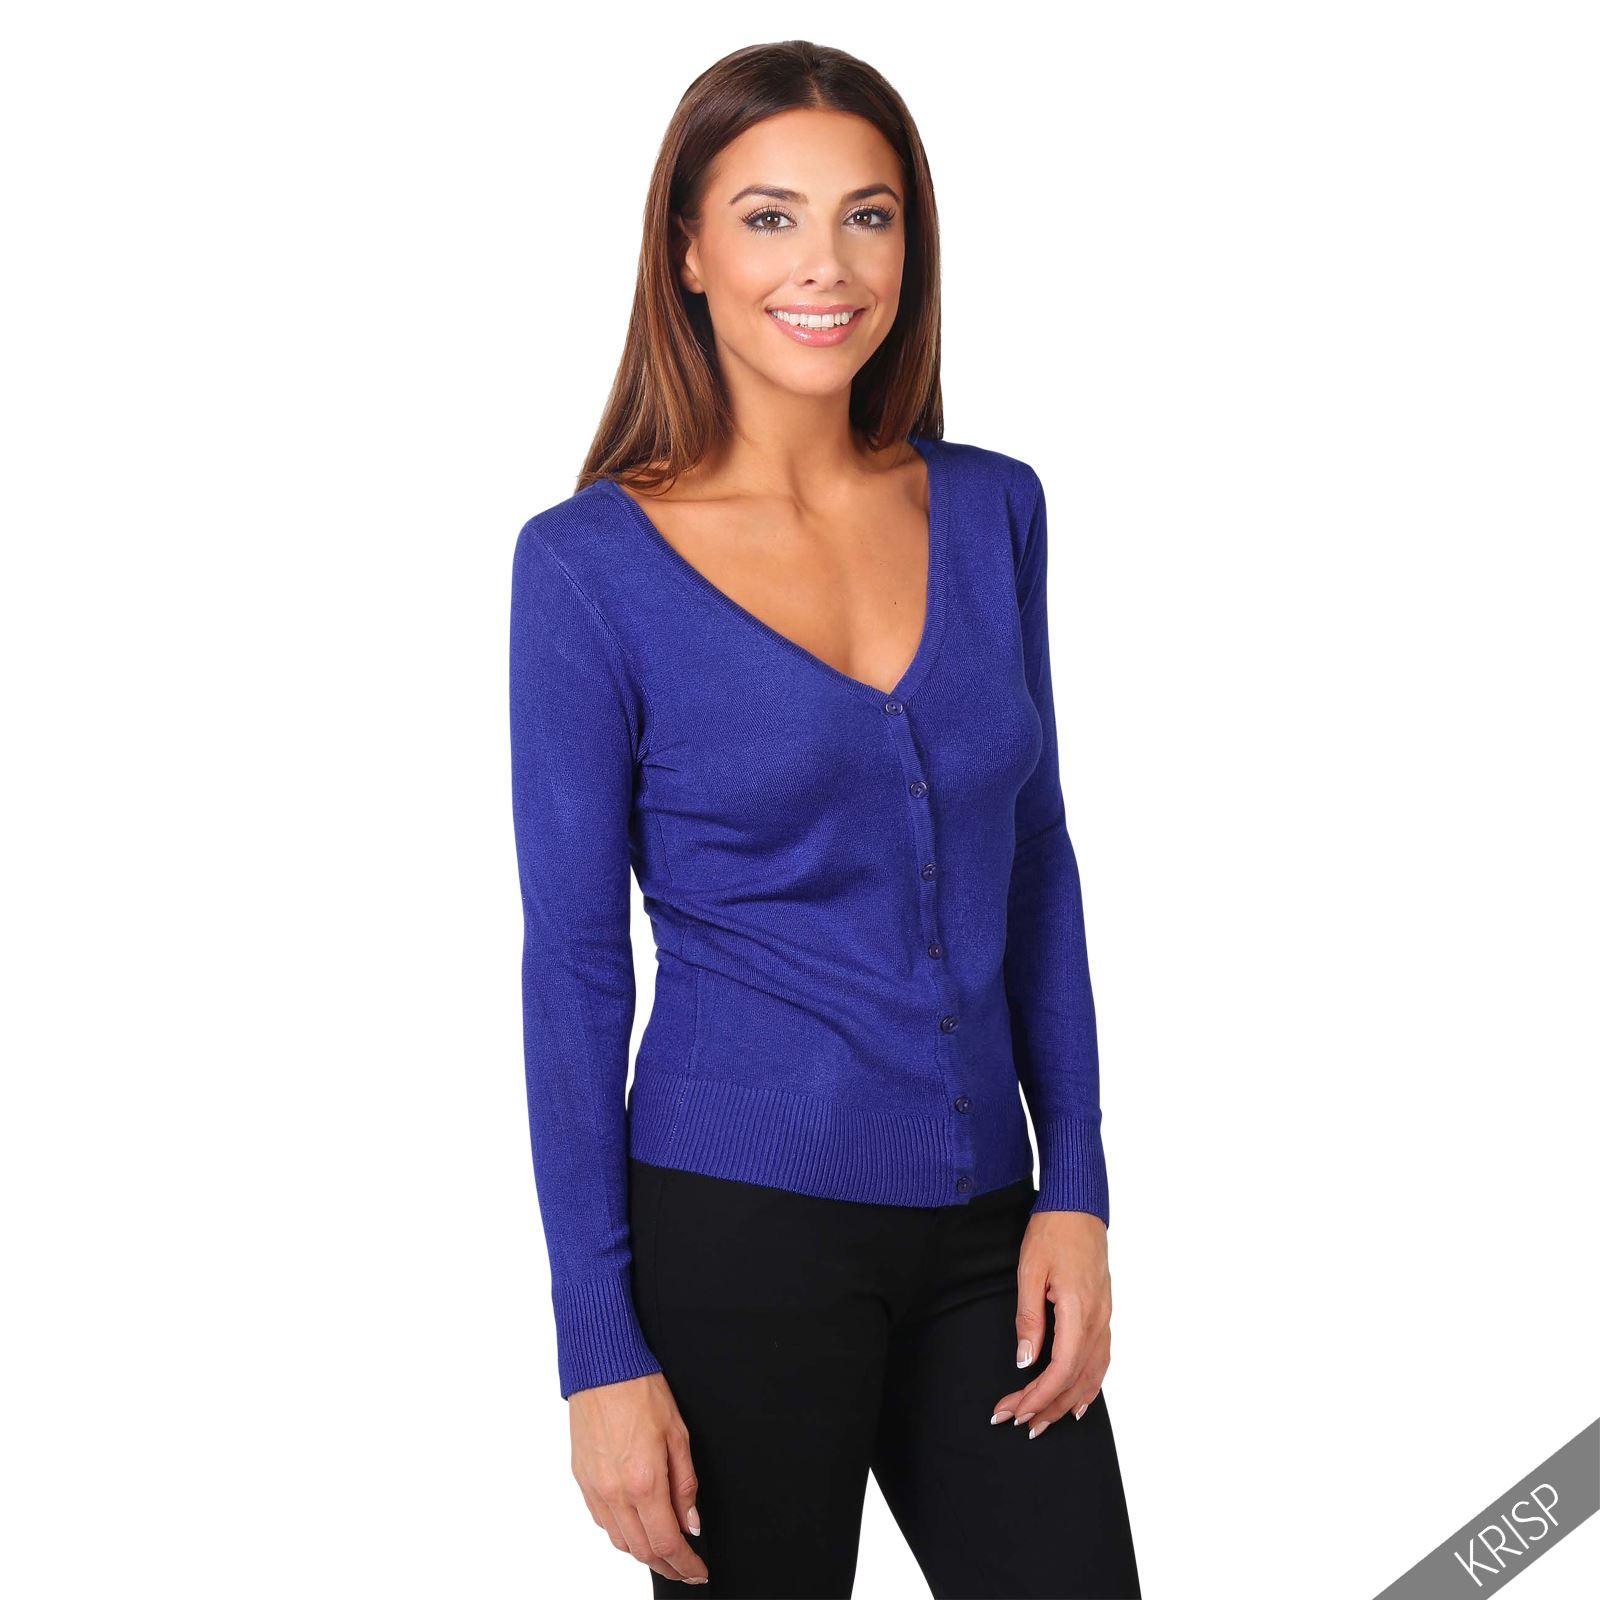 Hermosa Real Dama Azul Viste Reino Unido Componente - Vestido de ...